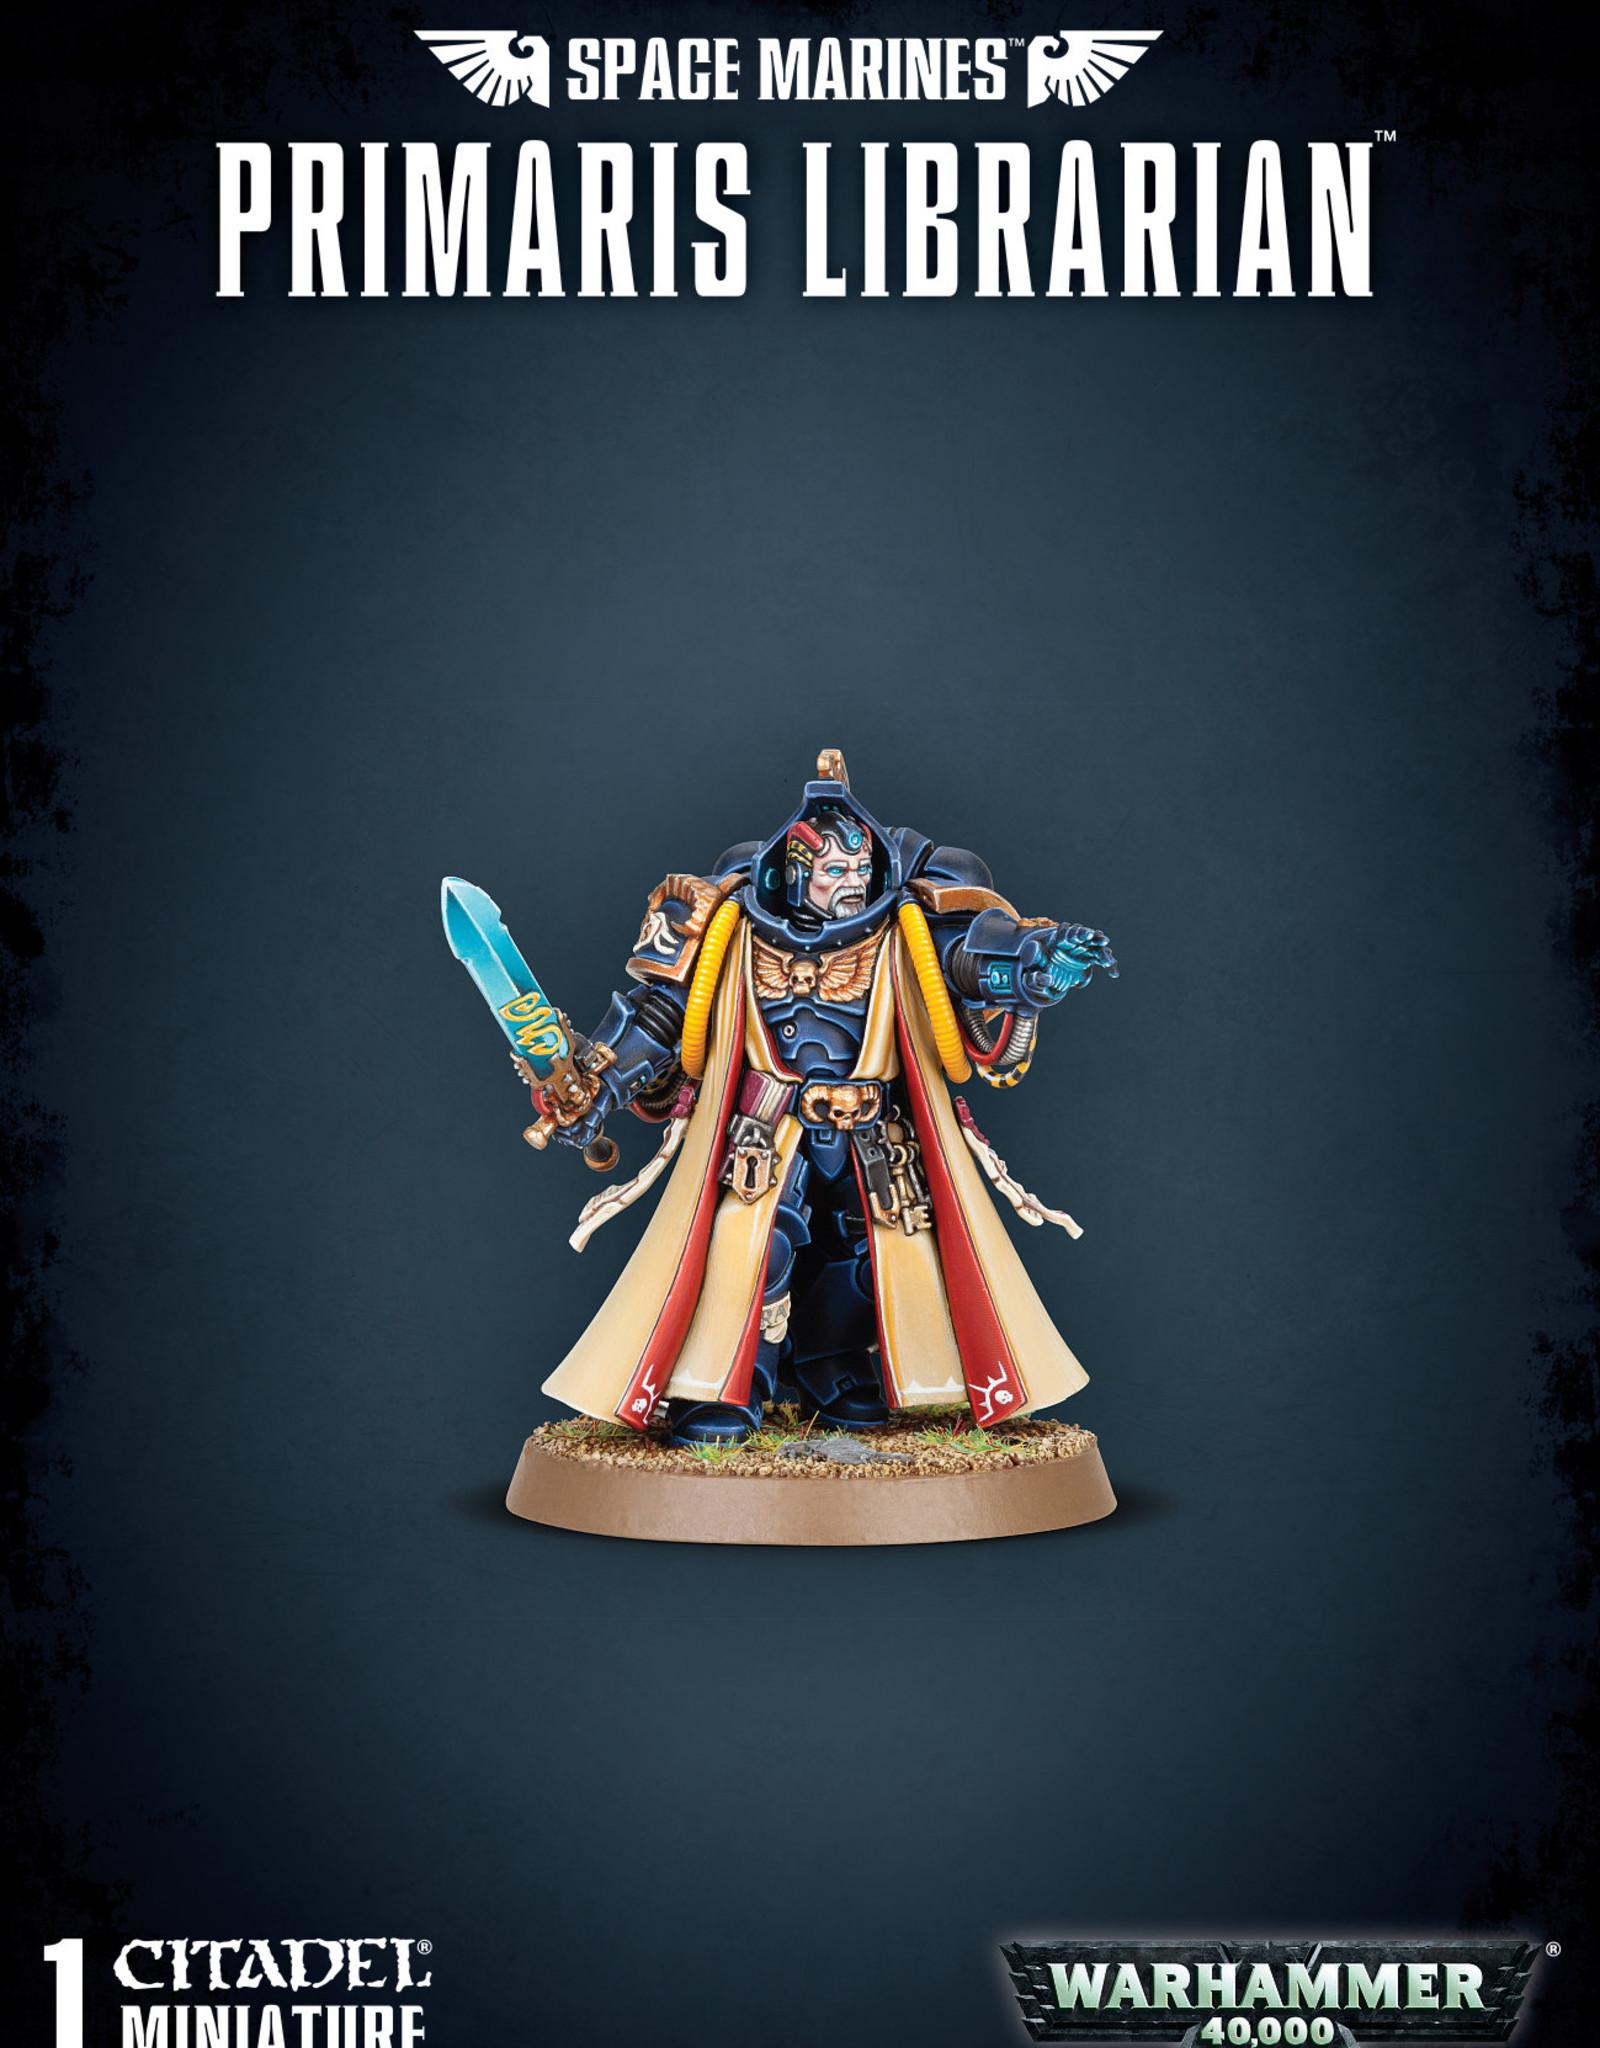 Warhammer 40K Space Marine Primaris Librarian